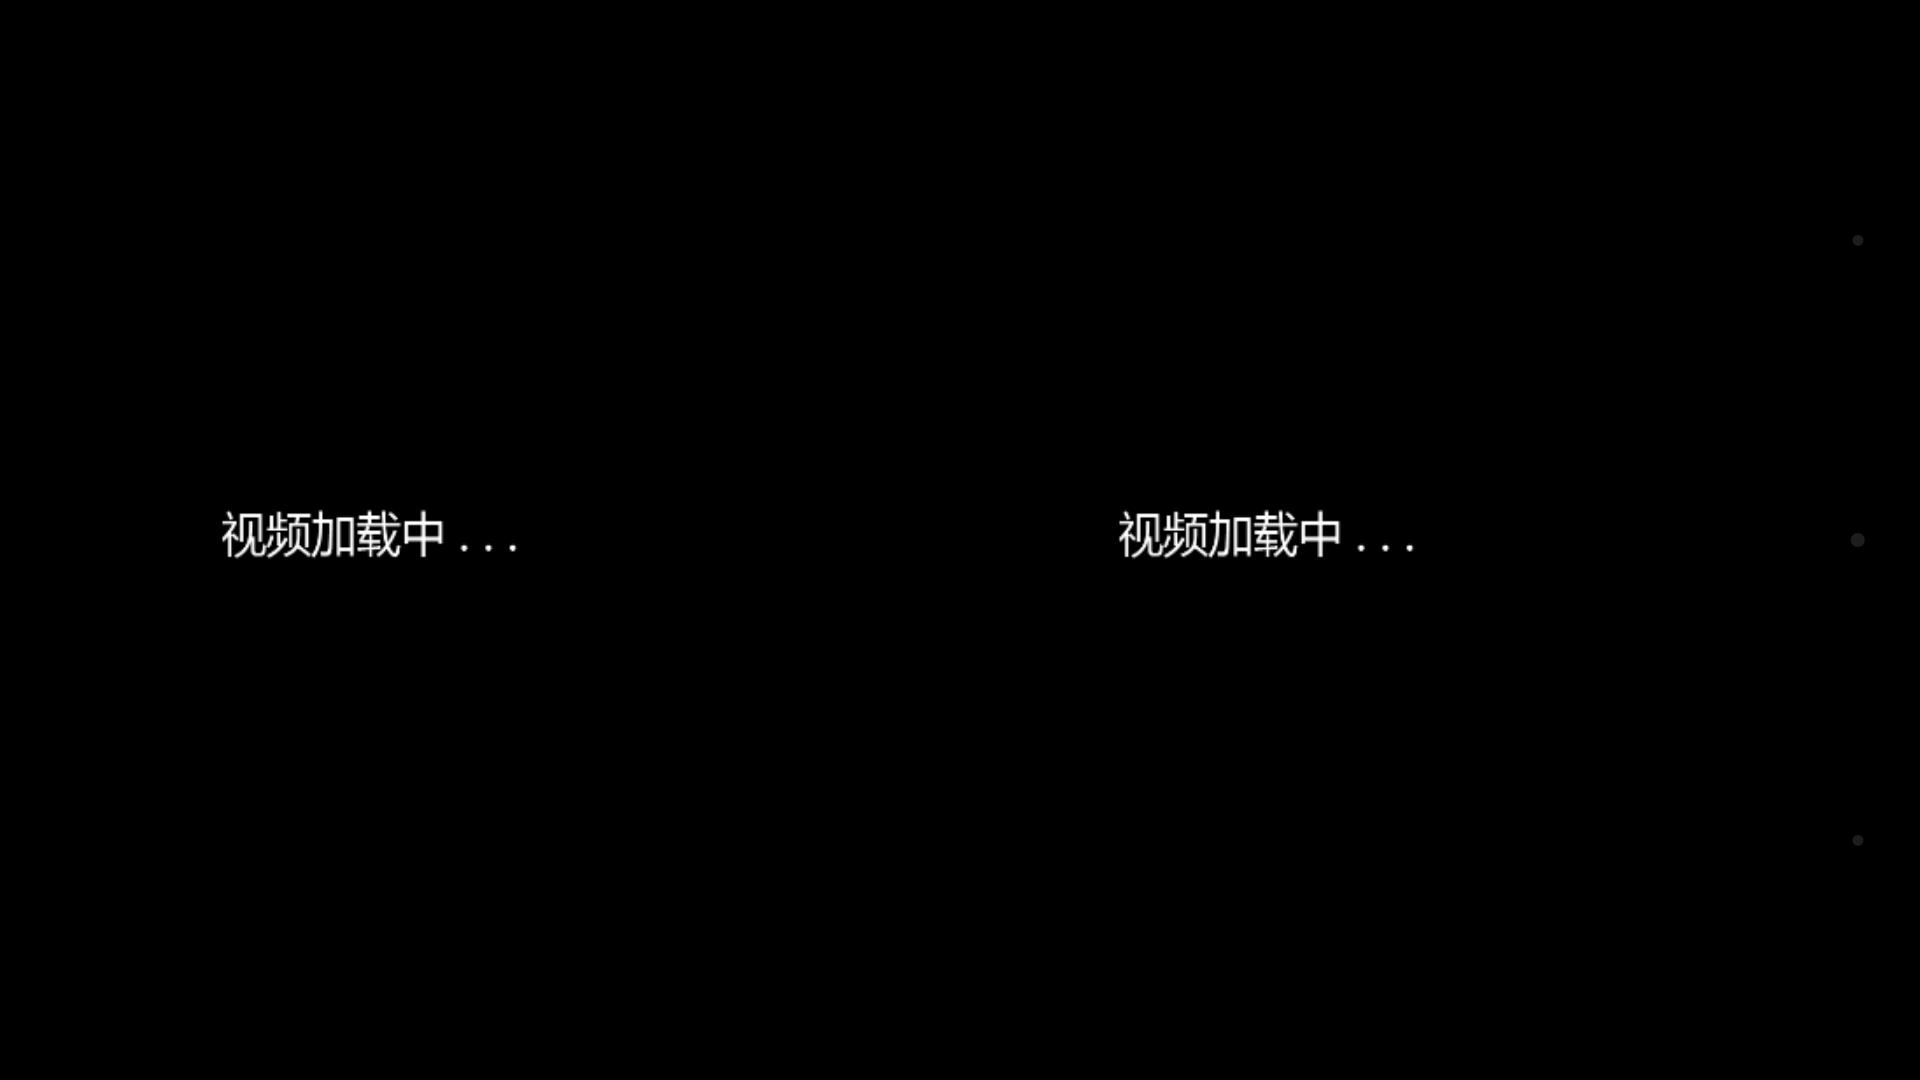 Screenshot_2014-12-17-09-54-25